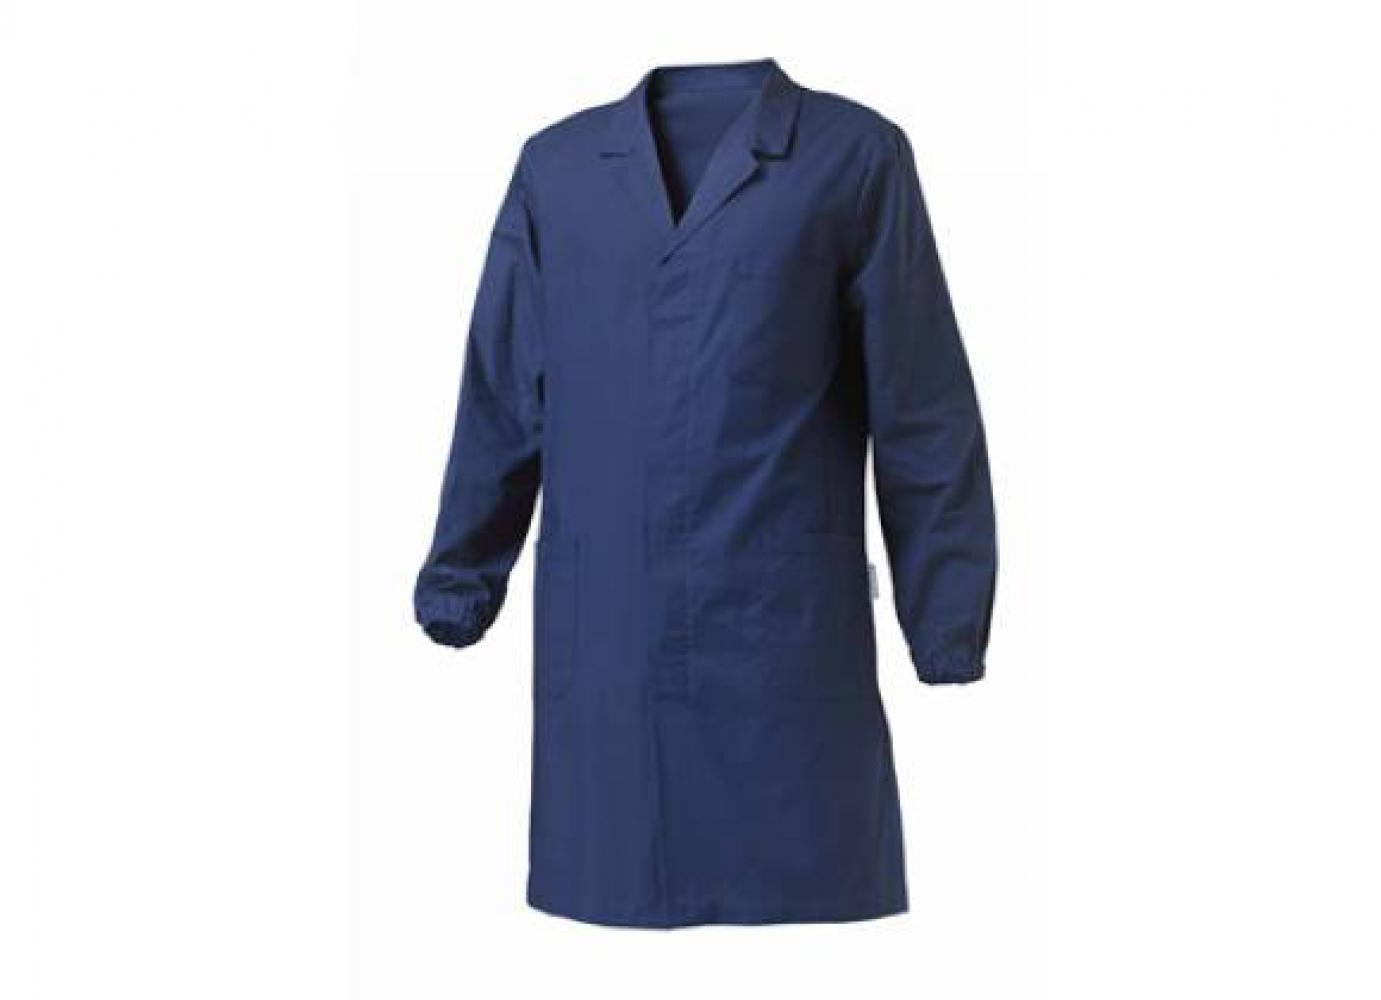 Acquista Camice Capri Blu Cotonegr 160 17545816 | Glooke.com